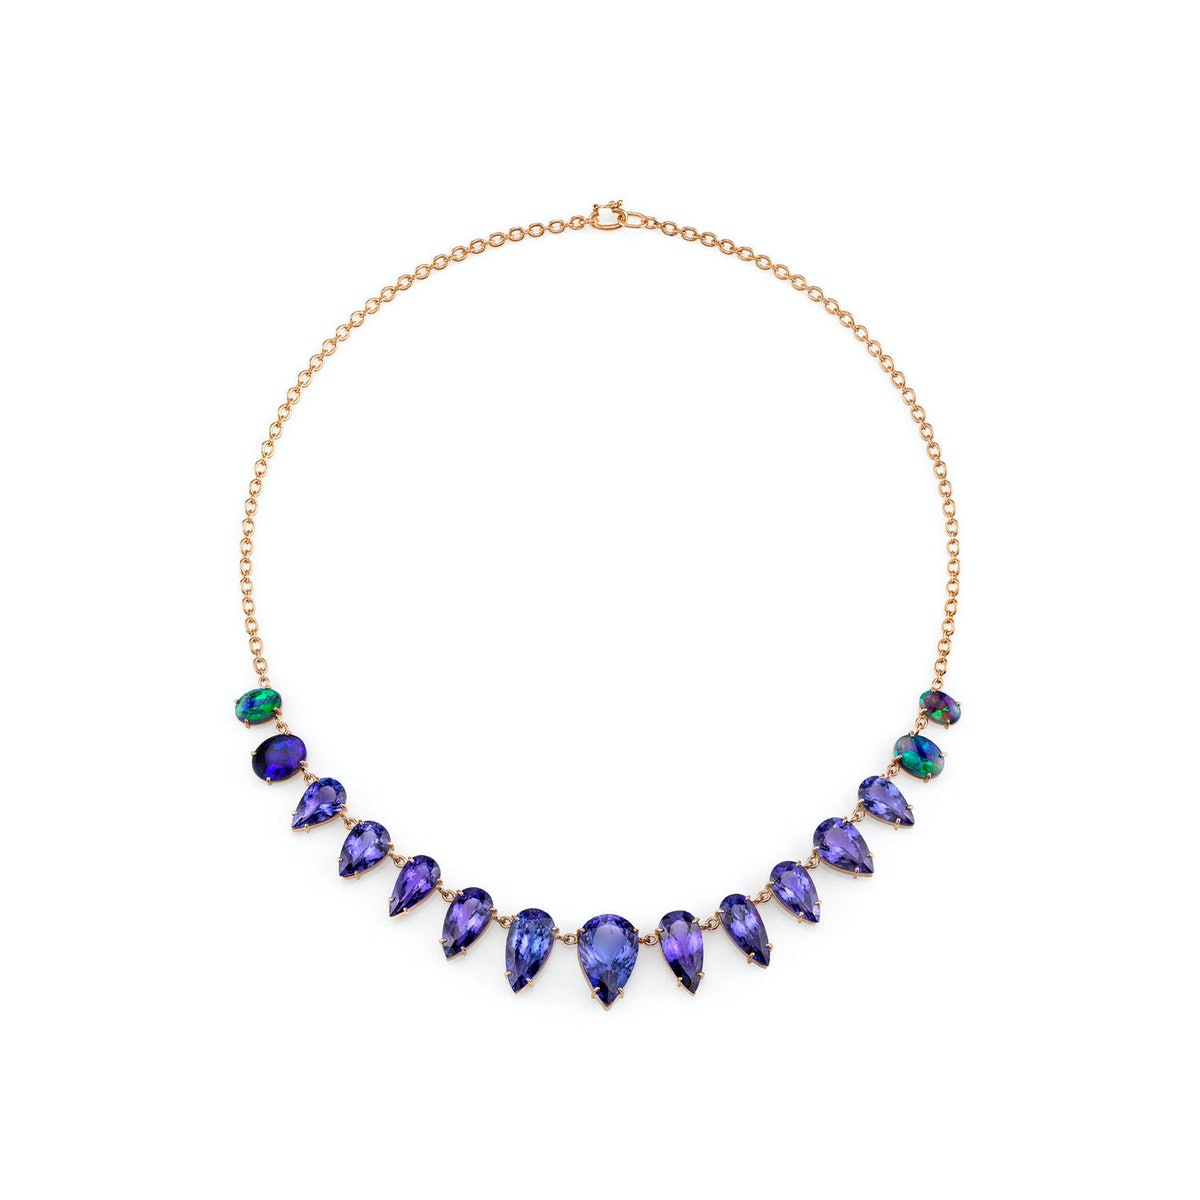 Irene Neuwirth tanzanite and opal necklace